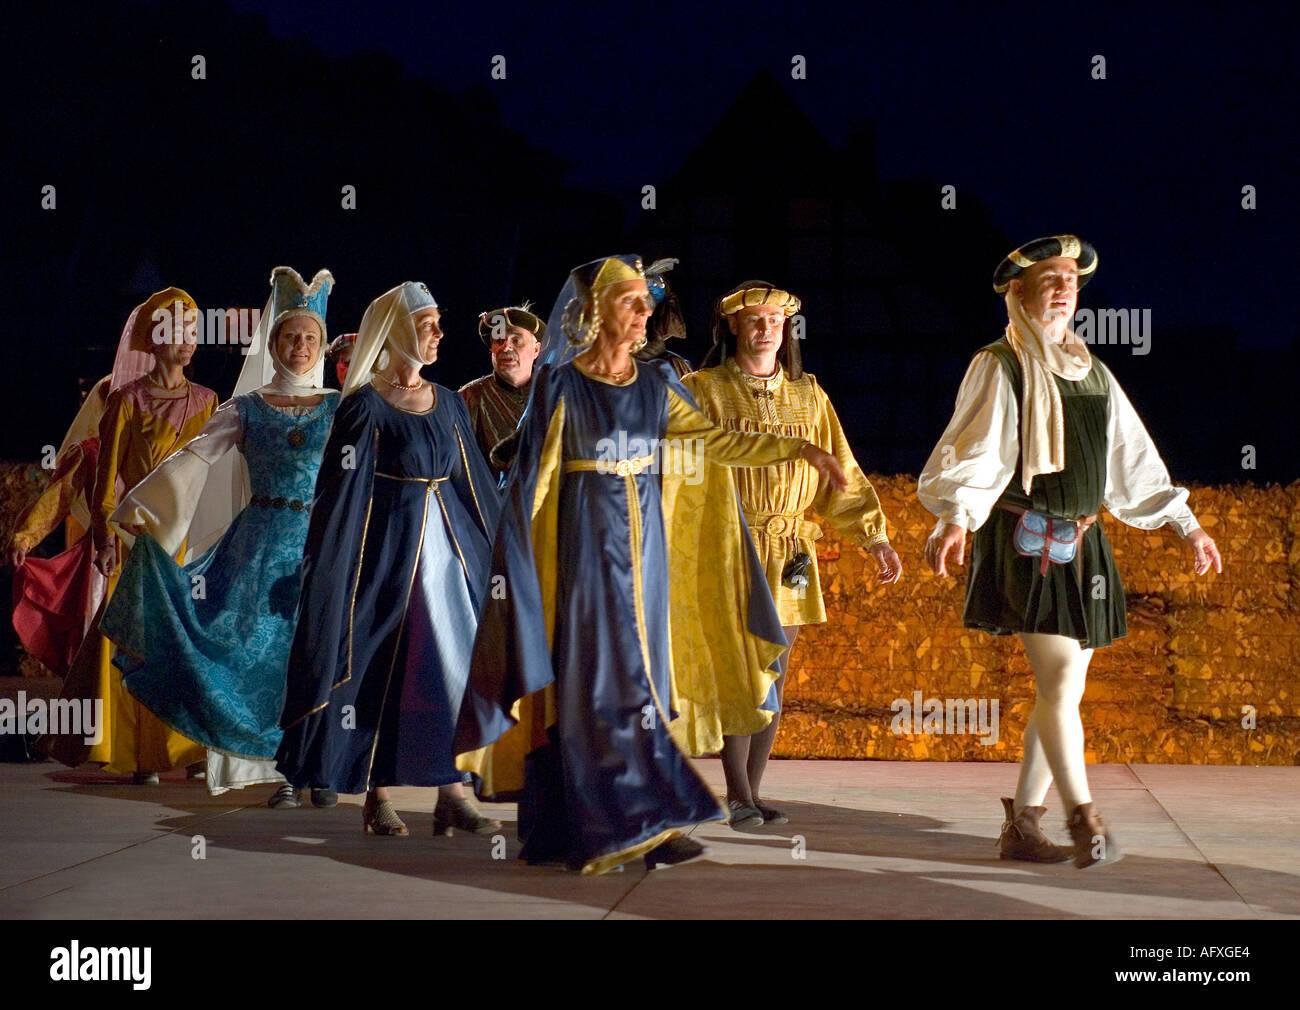 Ballerini medievali in Francia Immagini Stock